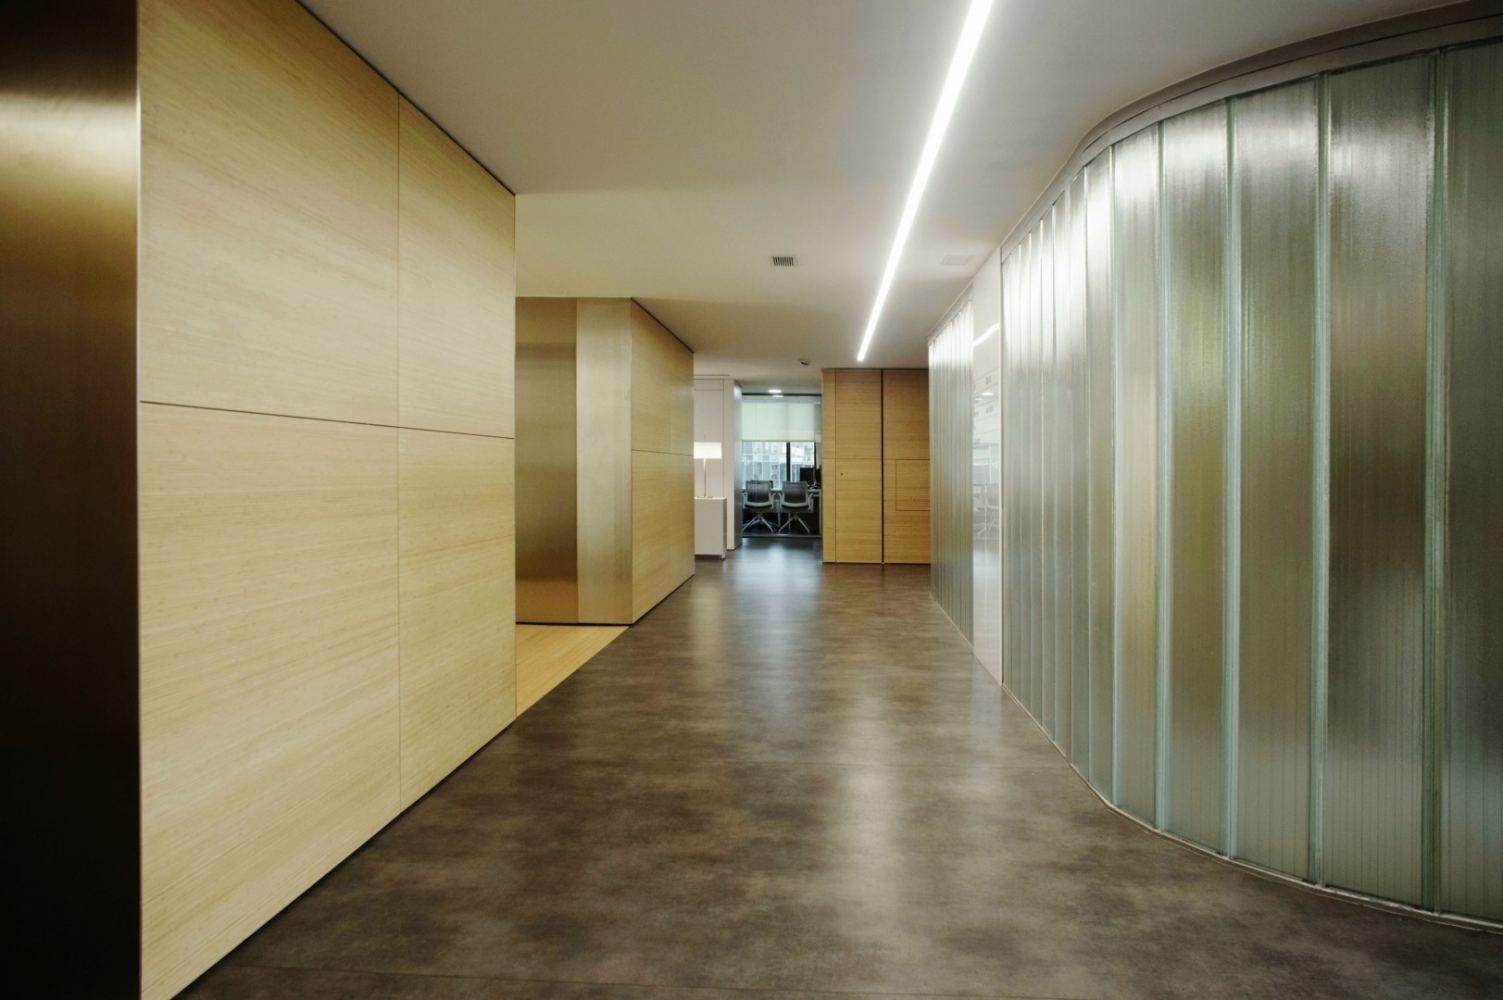 Barcelona's Hospital - Bamboo 3